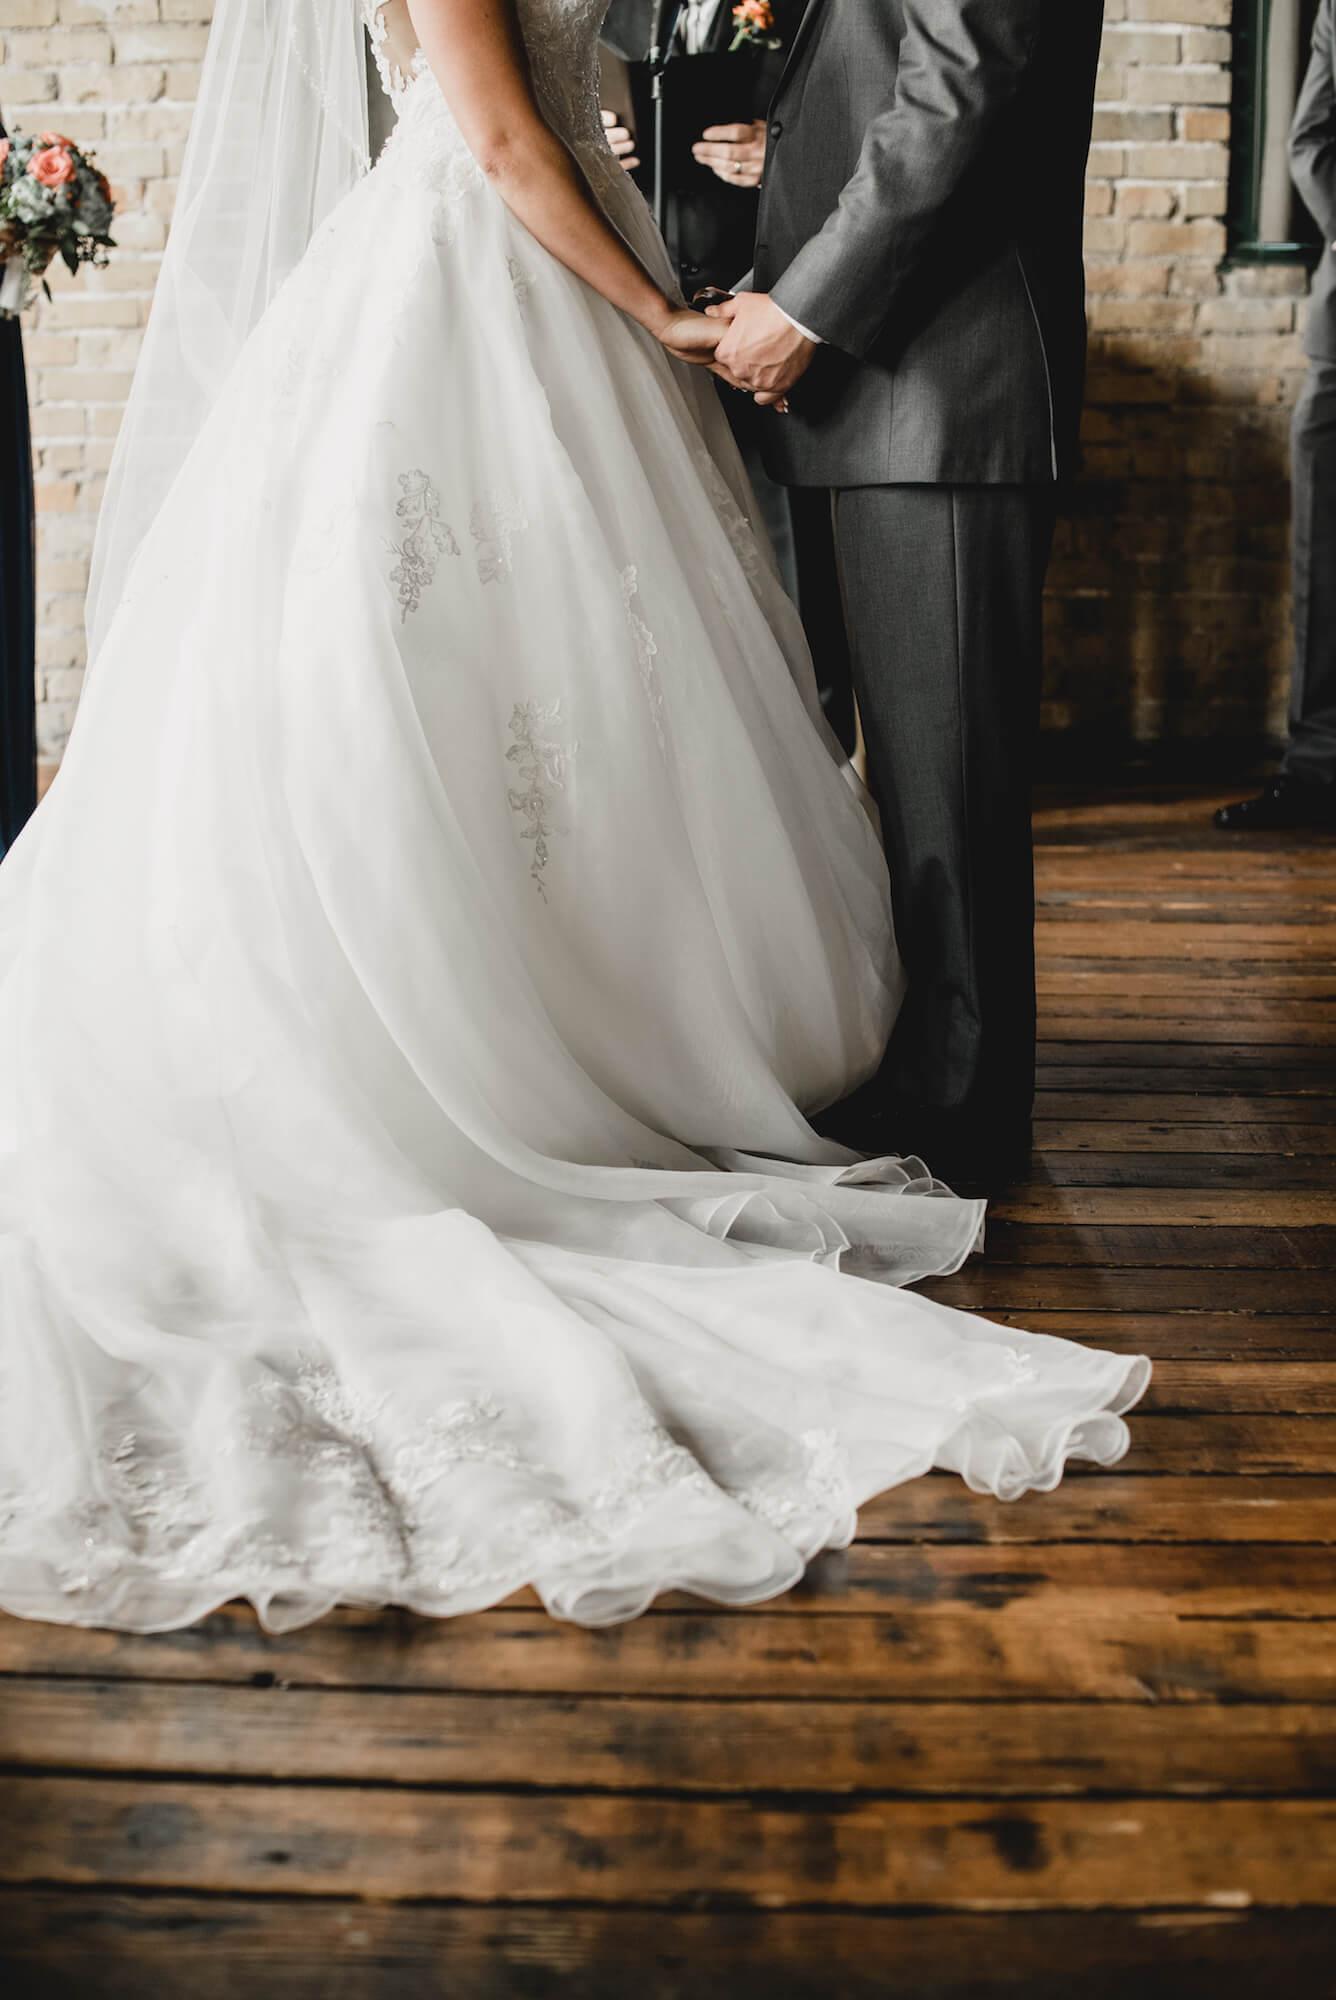 engle-olson-jen-chad-minnesota-wedding- (375 of 1332).jpg